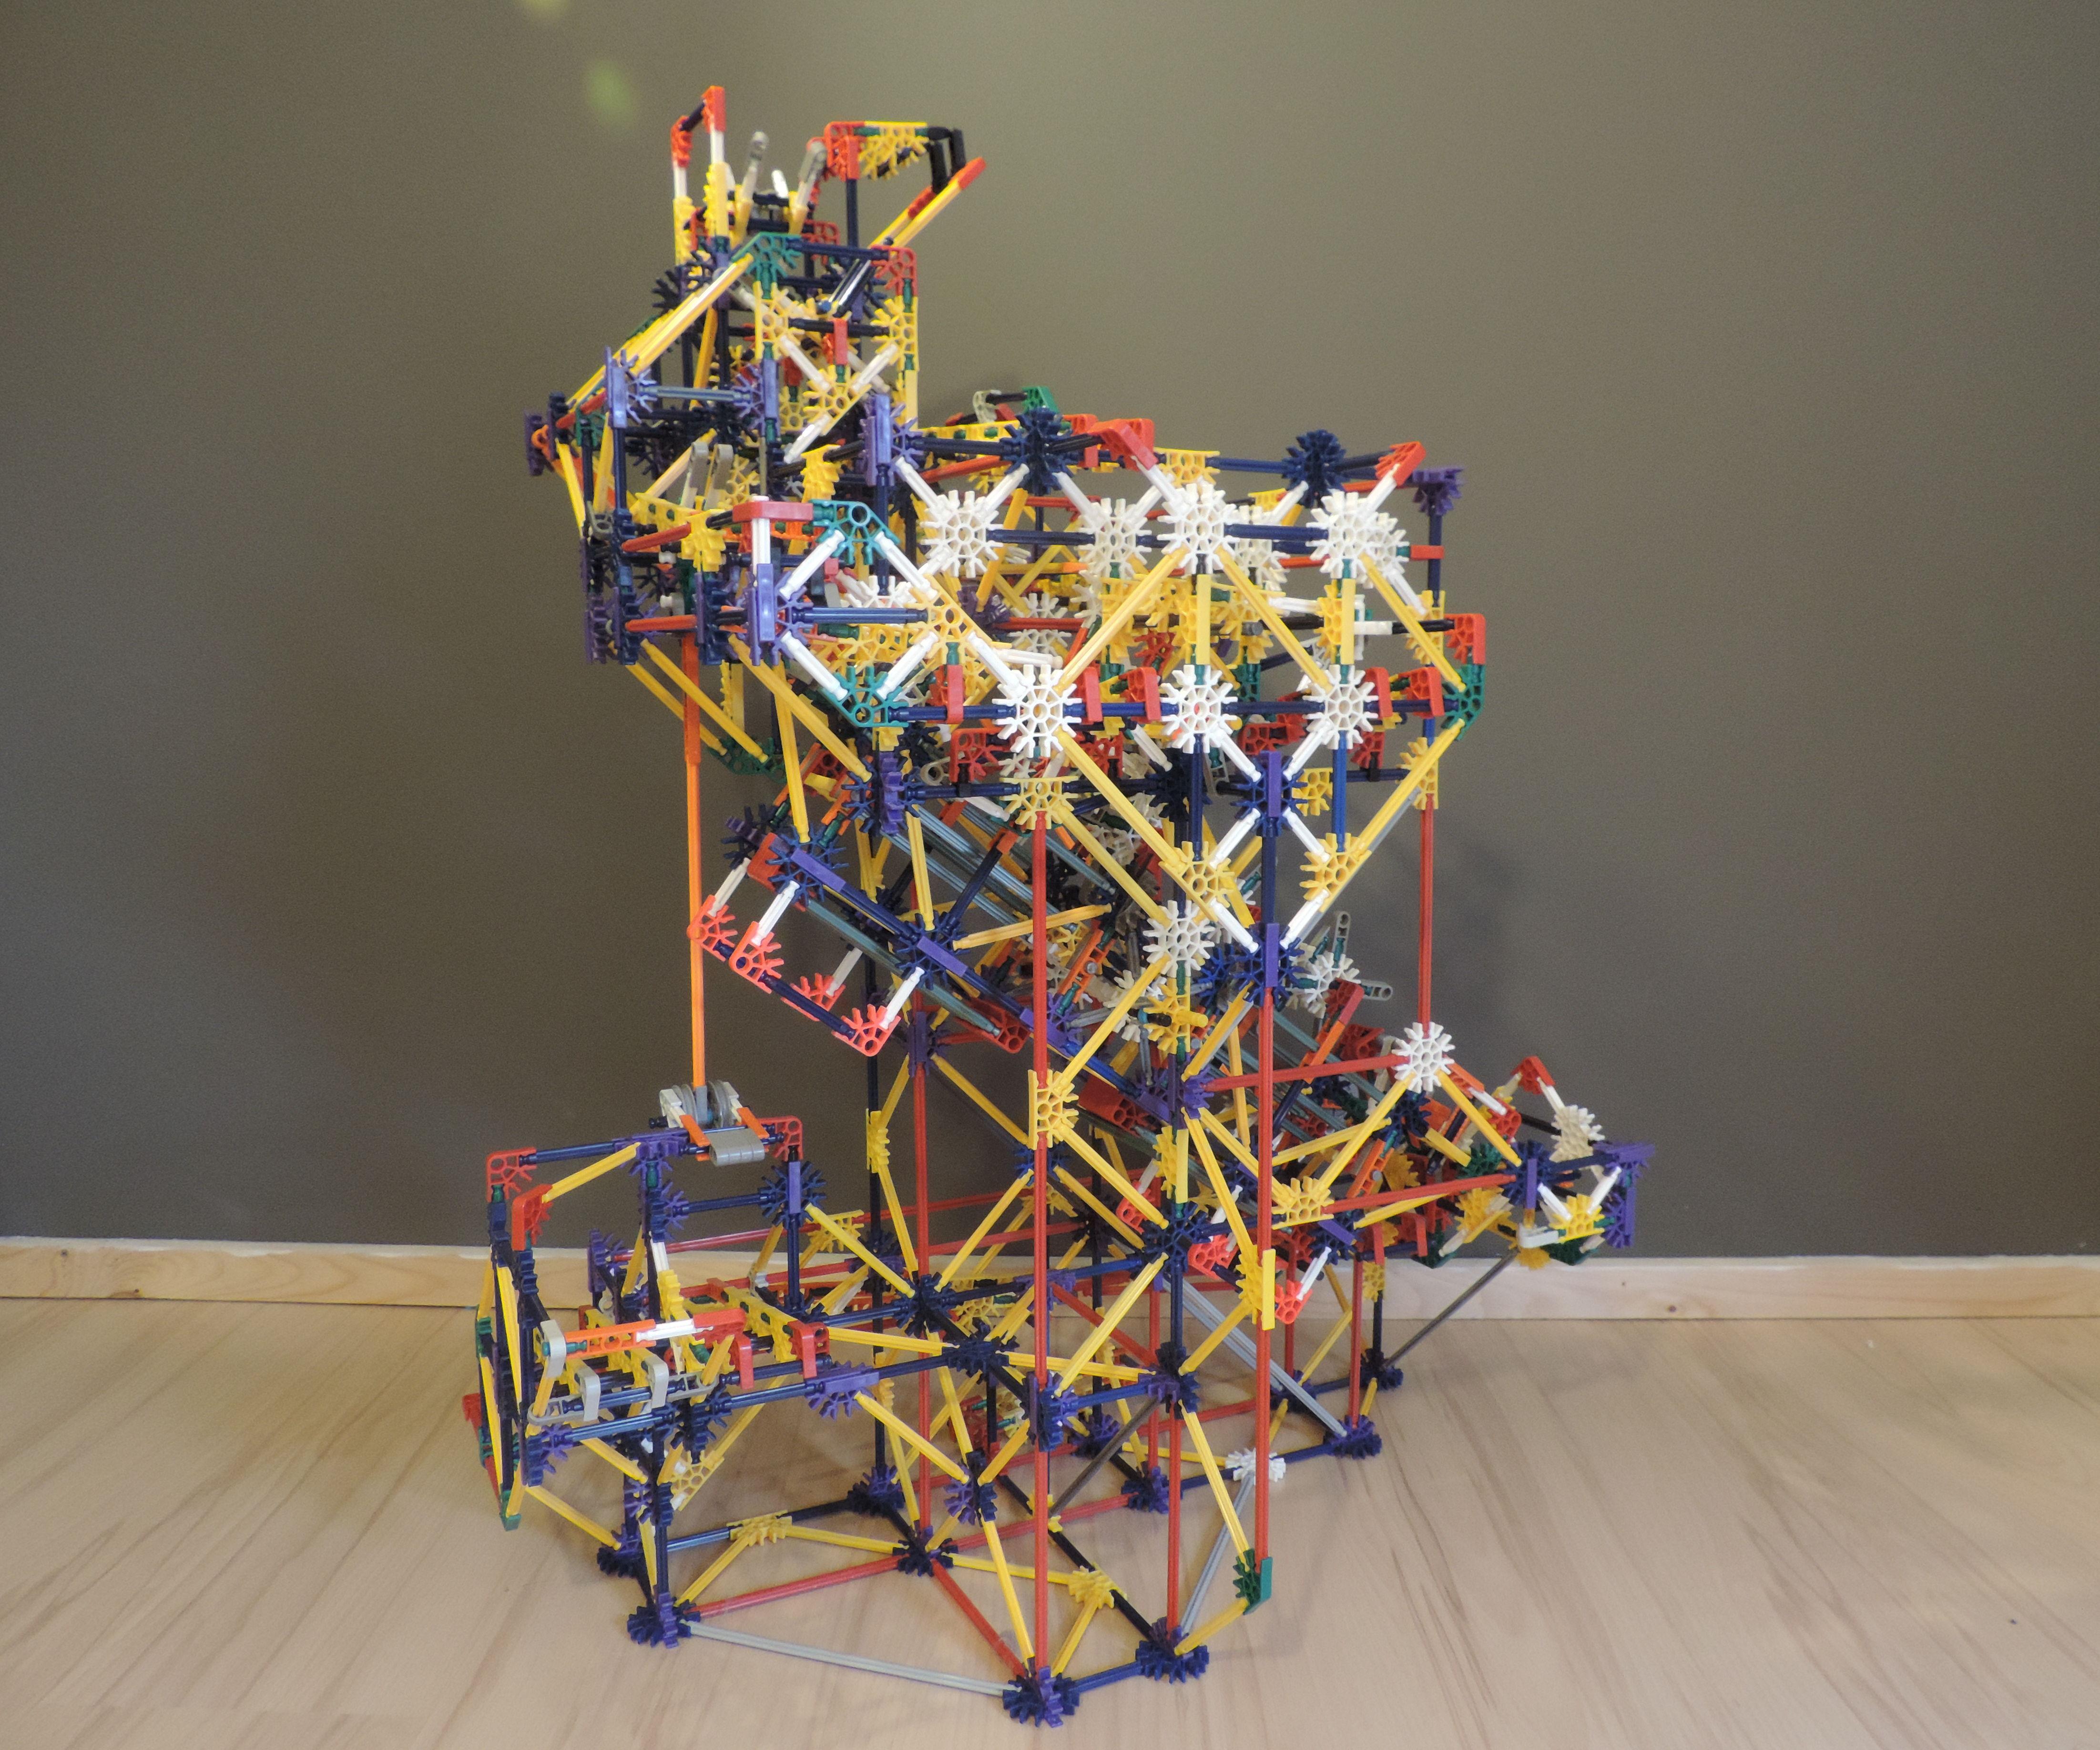 Knex Ball Machine Element: KHAOS